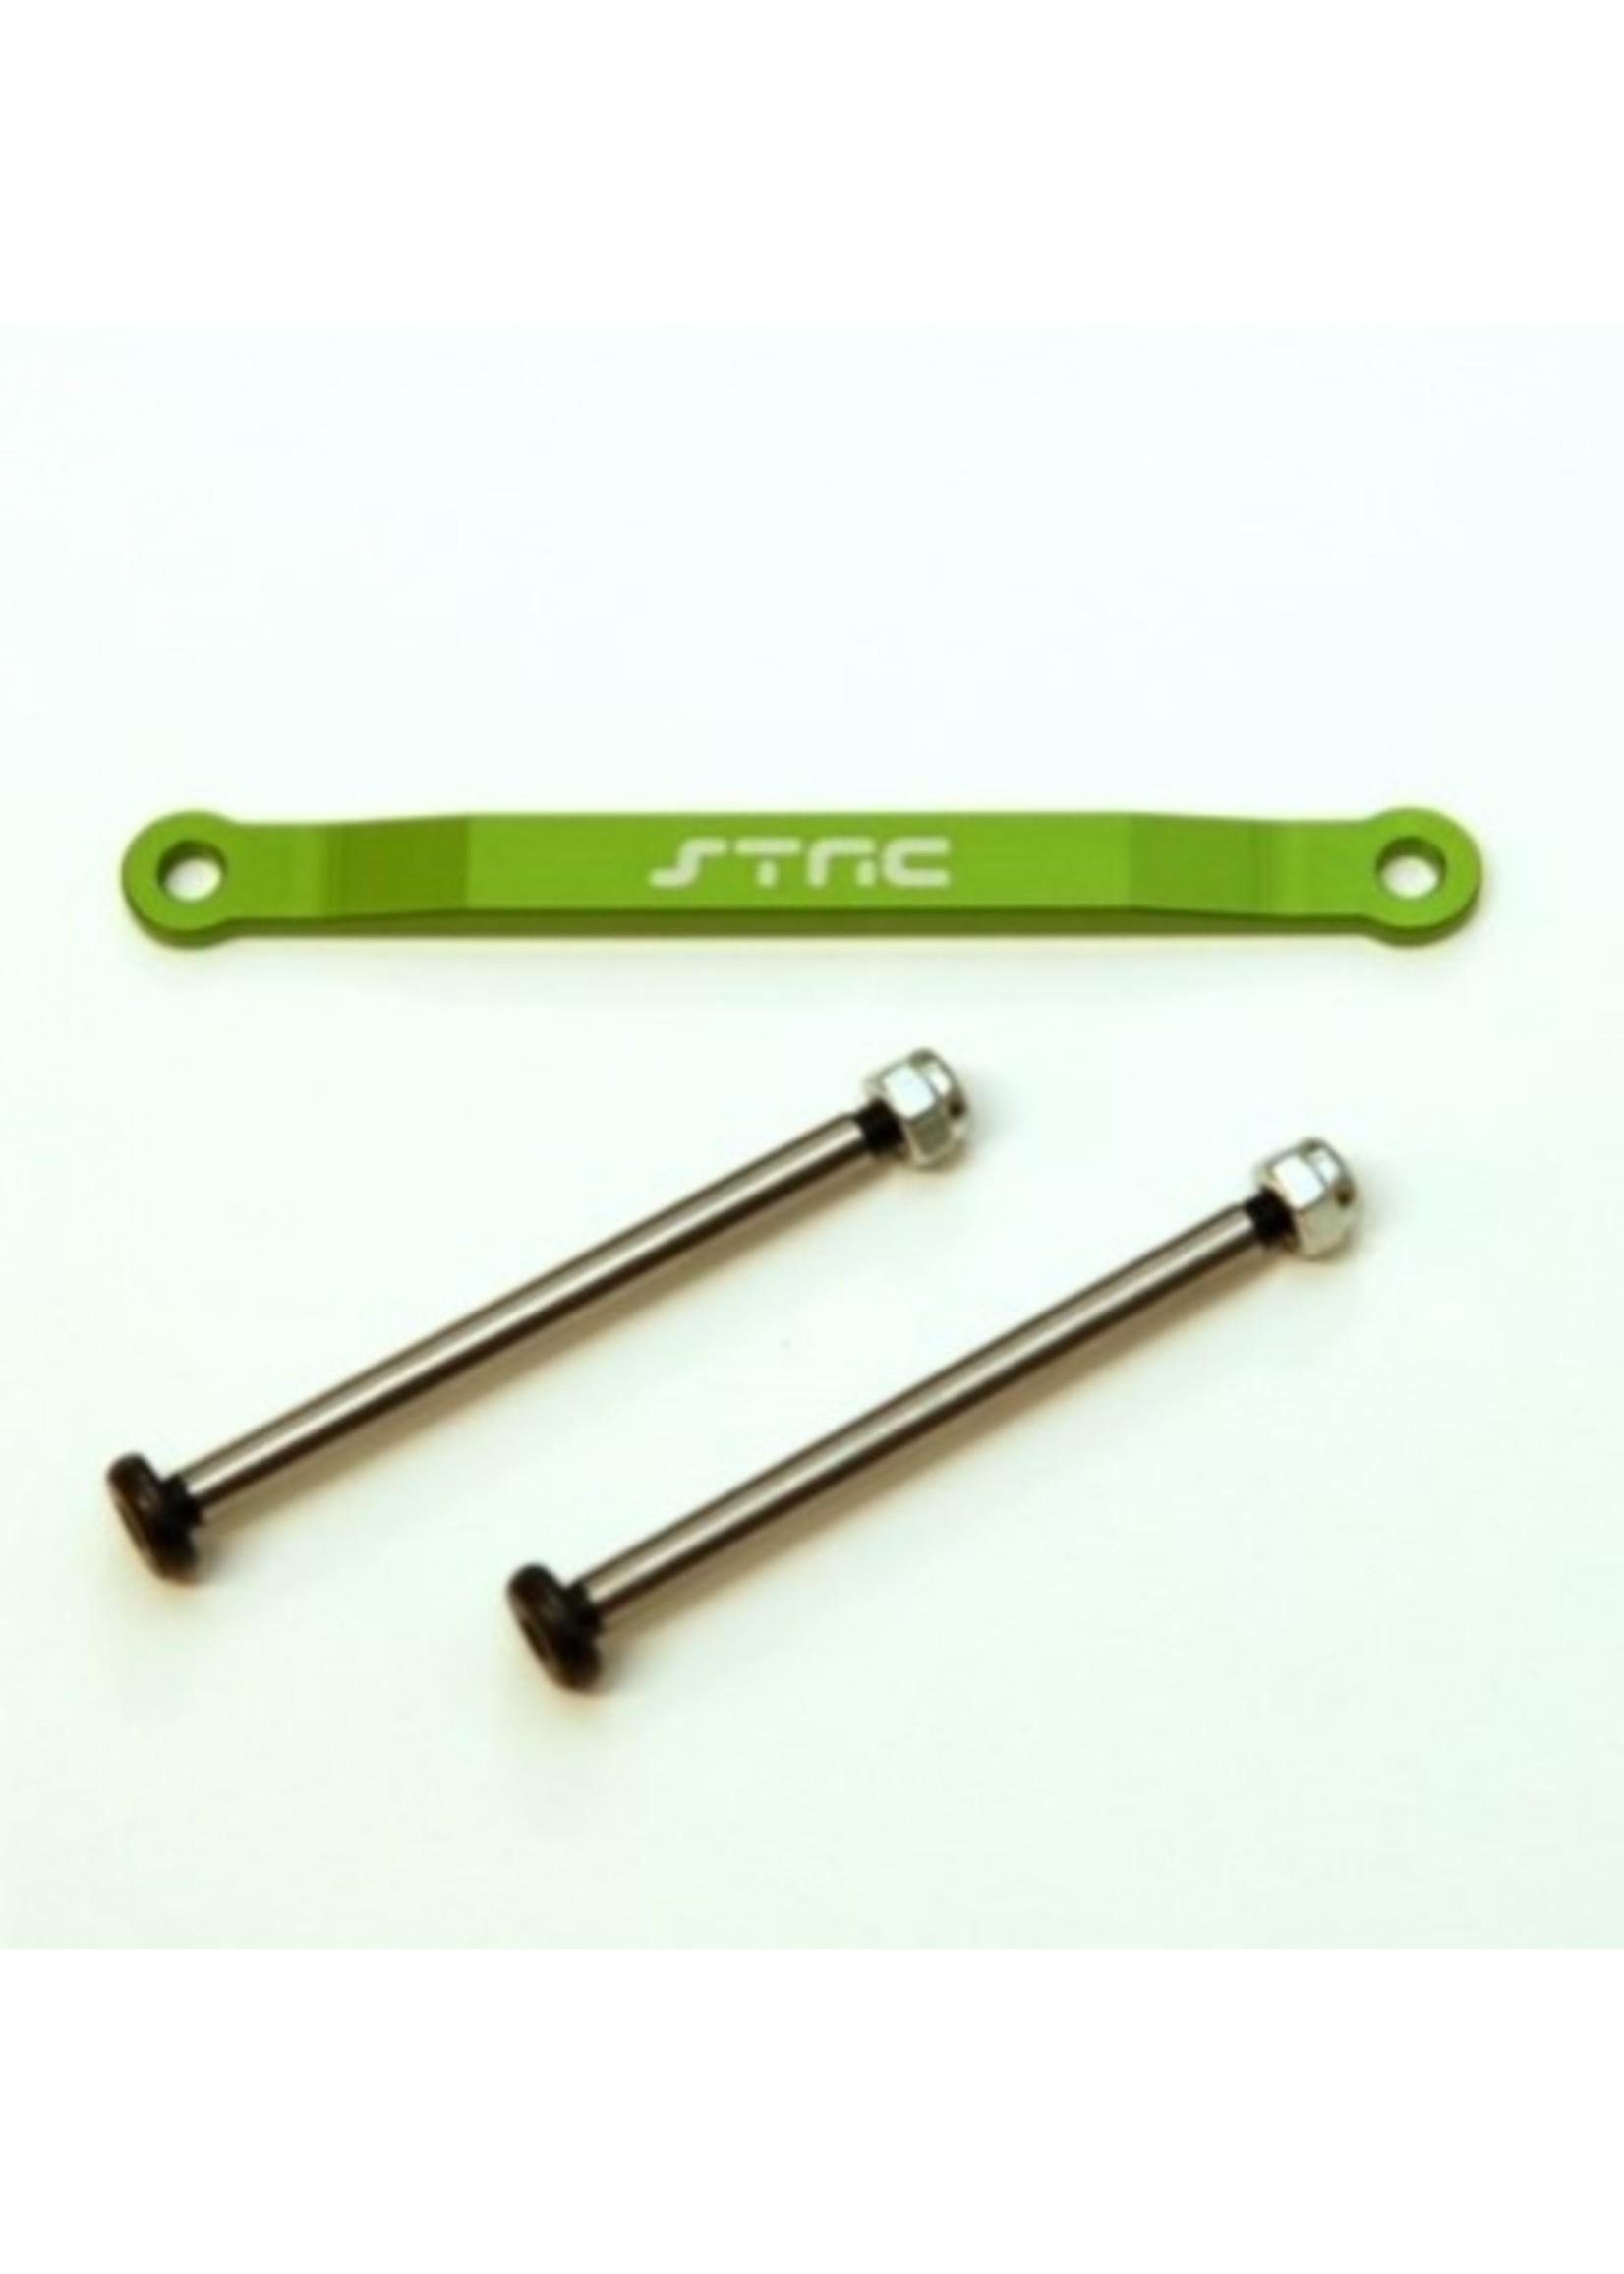 ST Racing Concepts SPTST2532XG ST Racing Concepts CNC Aluminum Front Hingepin Brace Kit, w/Lock-nut Style Hingepins (Green)